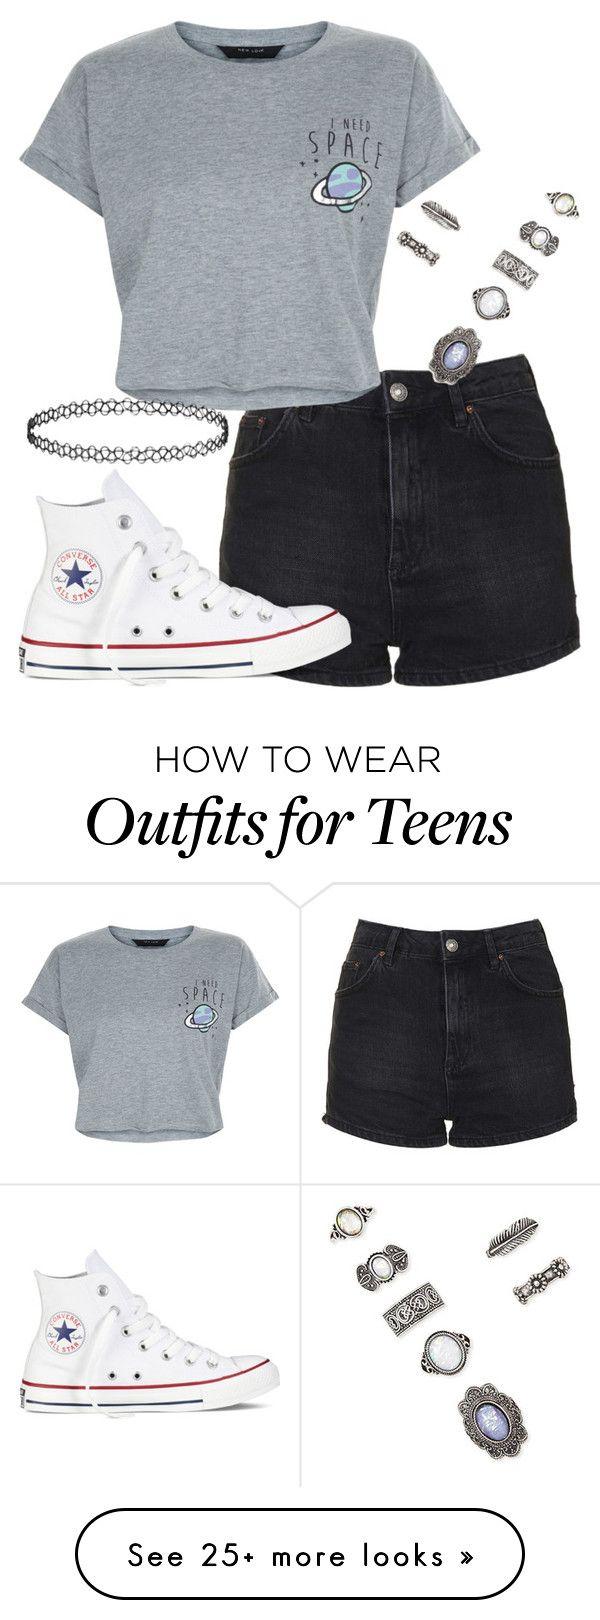 Conseguir estos outfits